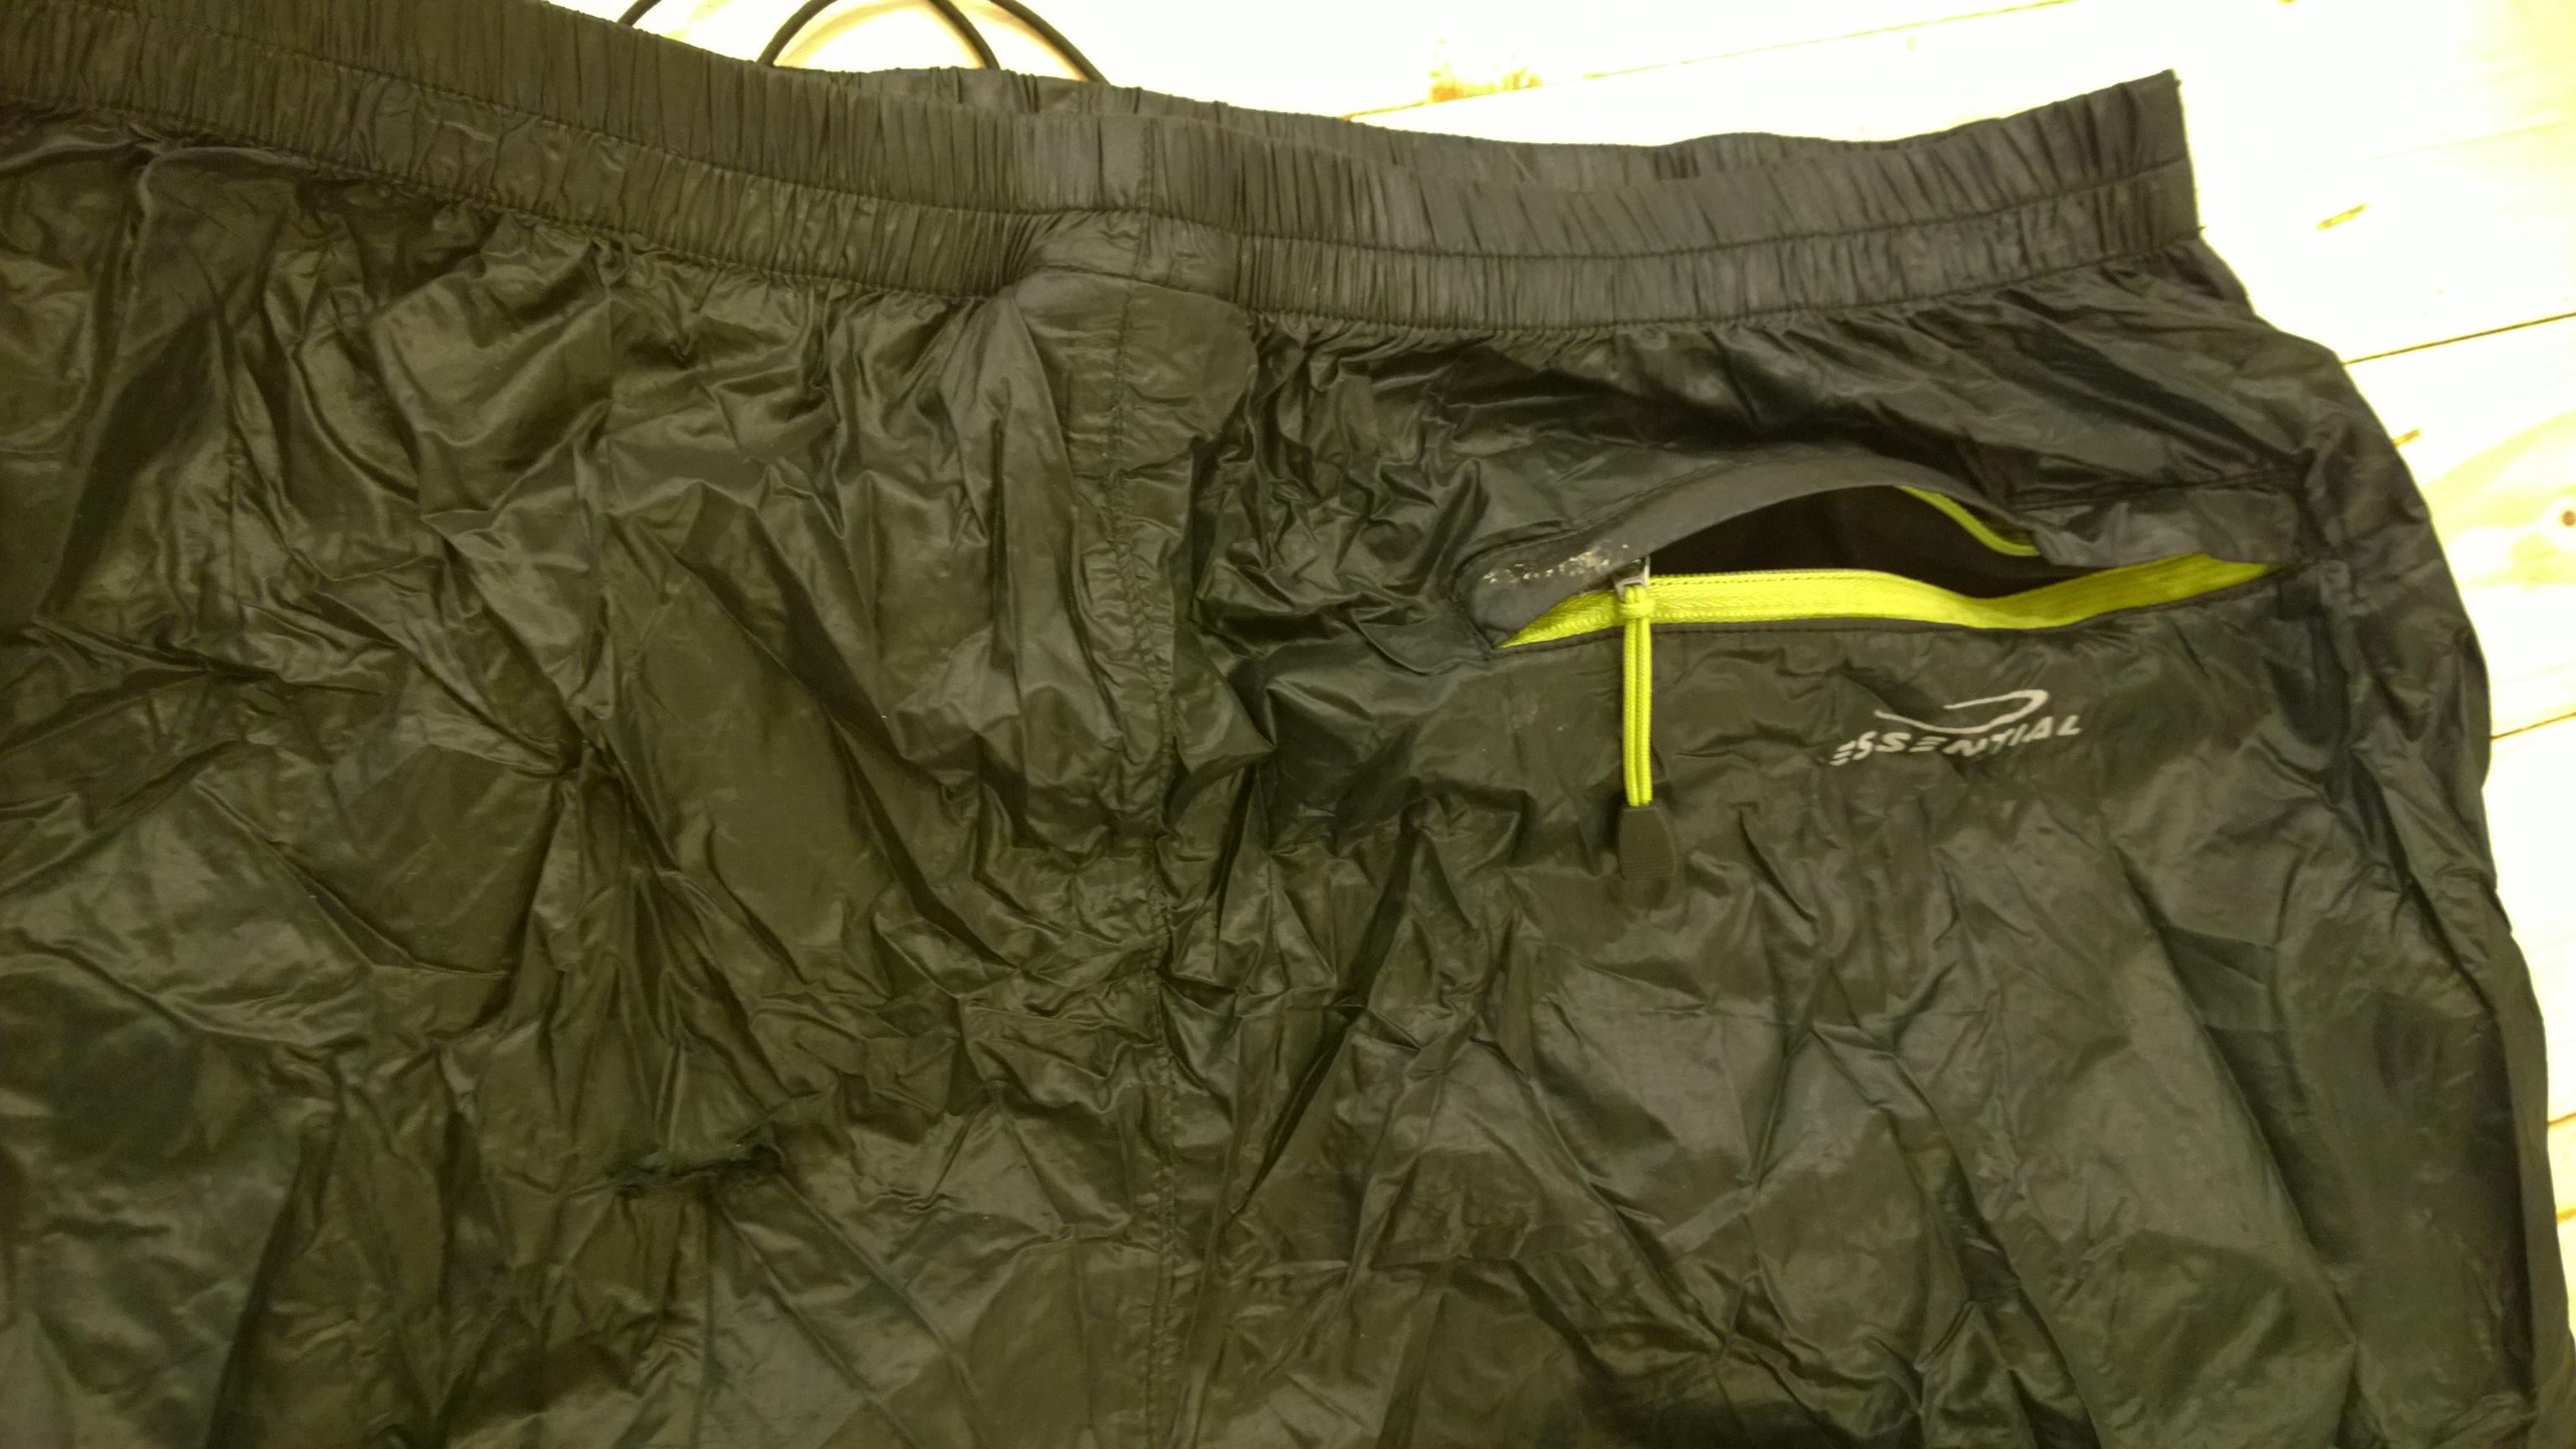 Outdoor recenzia: CAMP Magic Pants, zadné vrecko na zips